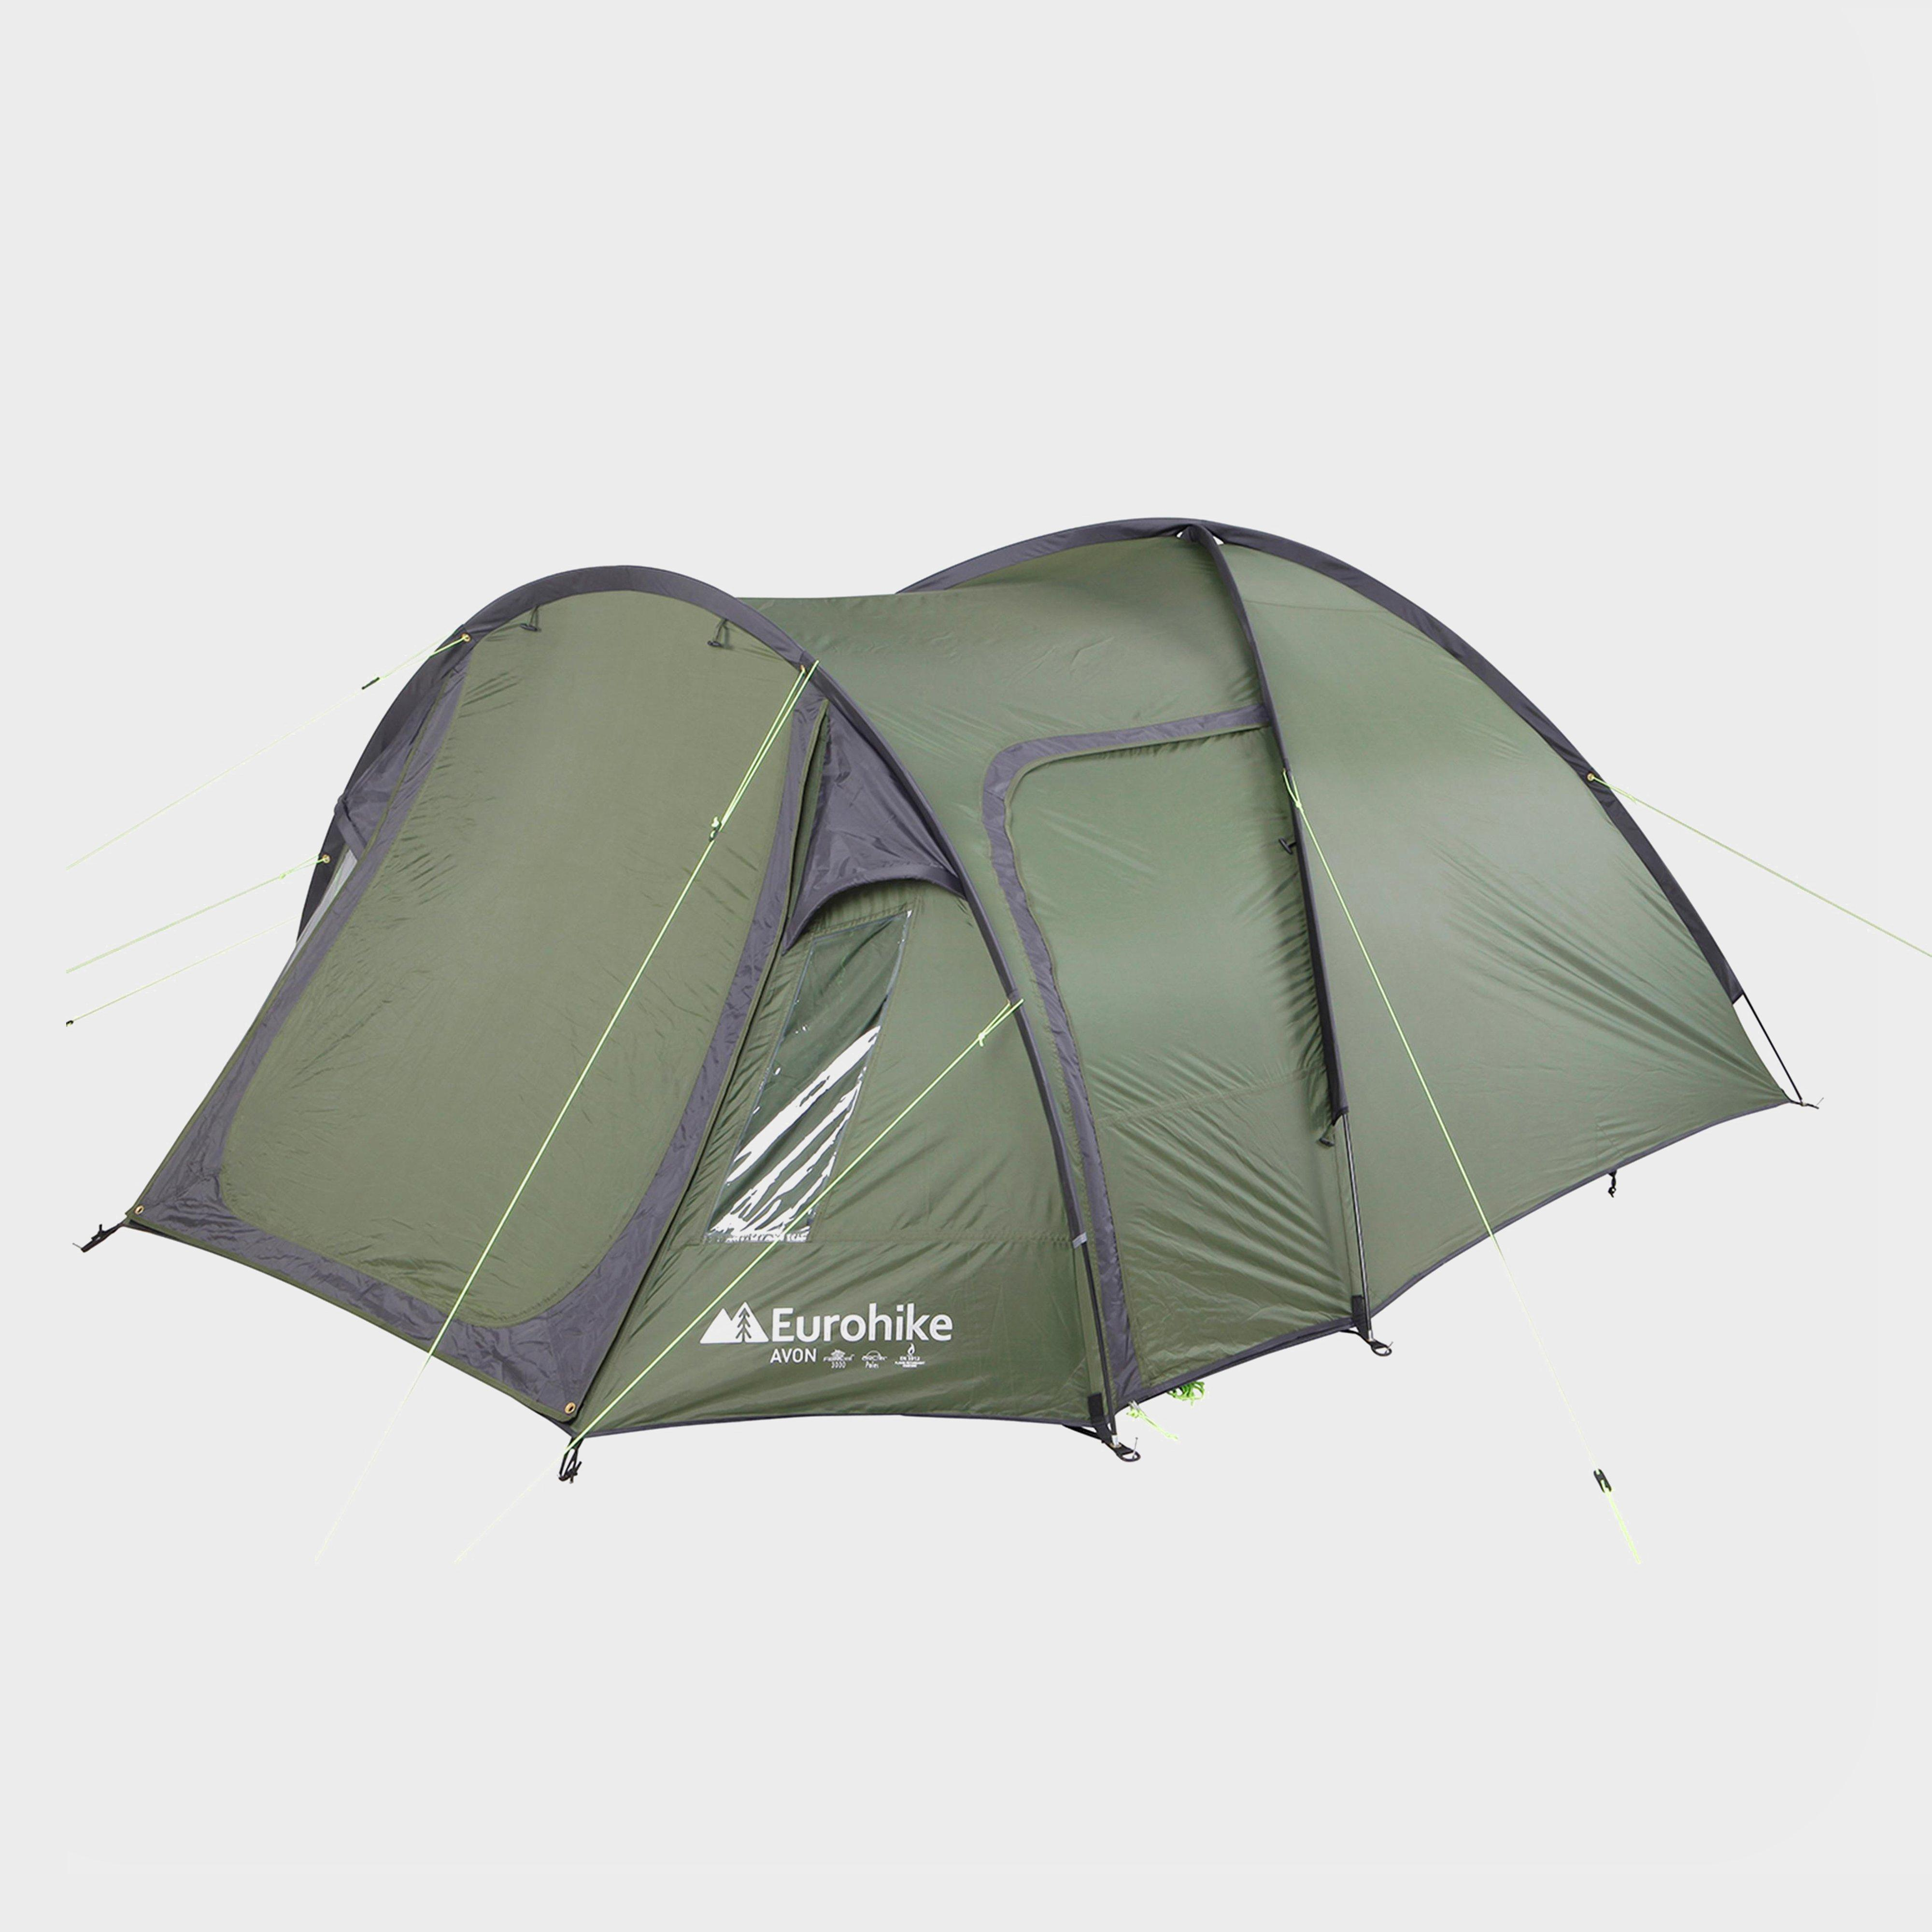 EUROHIKE Avon DLX 3 Man Tent  sc 1 st  Blacks & 3 Man Tents u0026 3 Person Tents | Blacks